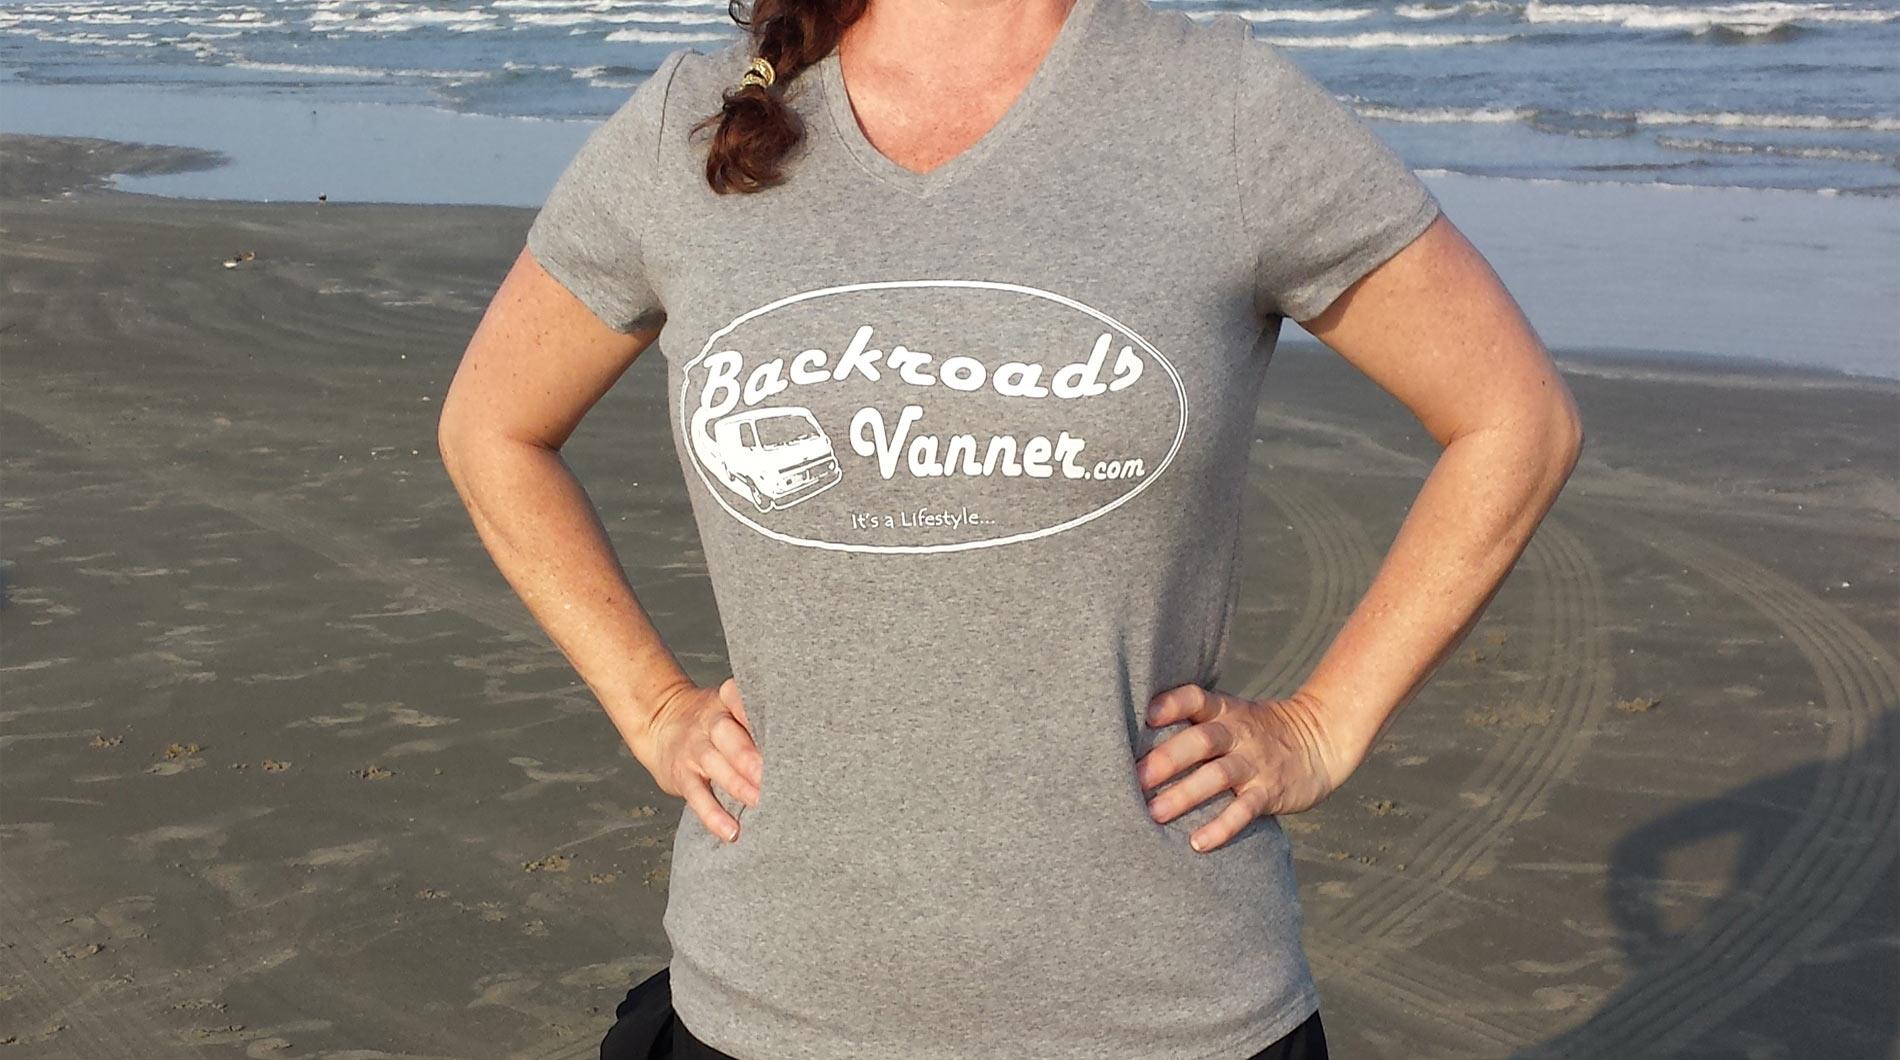 Women's Grey/White V-NeckT-Shirt with Vintage Backroads Vanner Logo